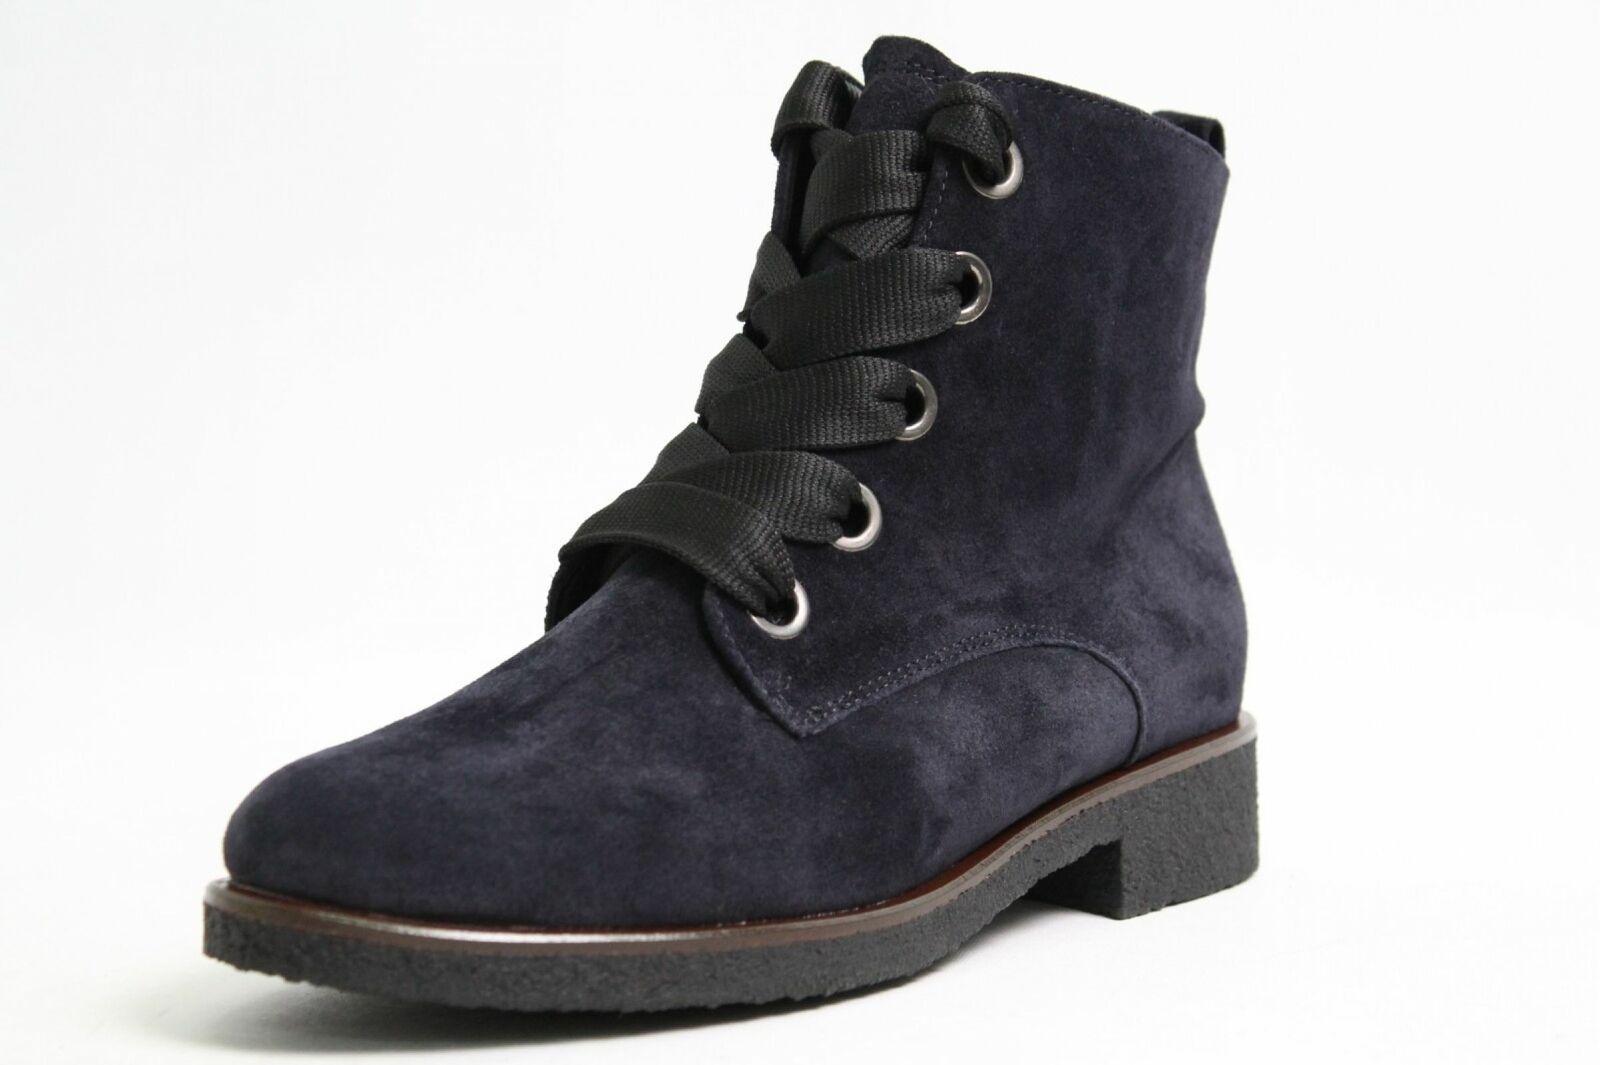 Gabor Stiefeletten blau Nubuk Leder komfort Damen Schuhweite